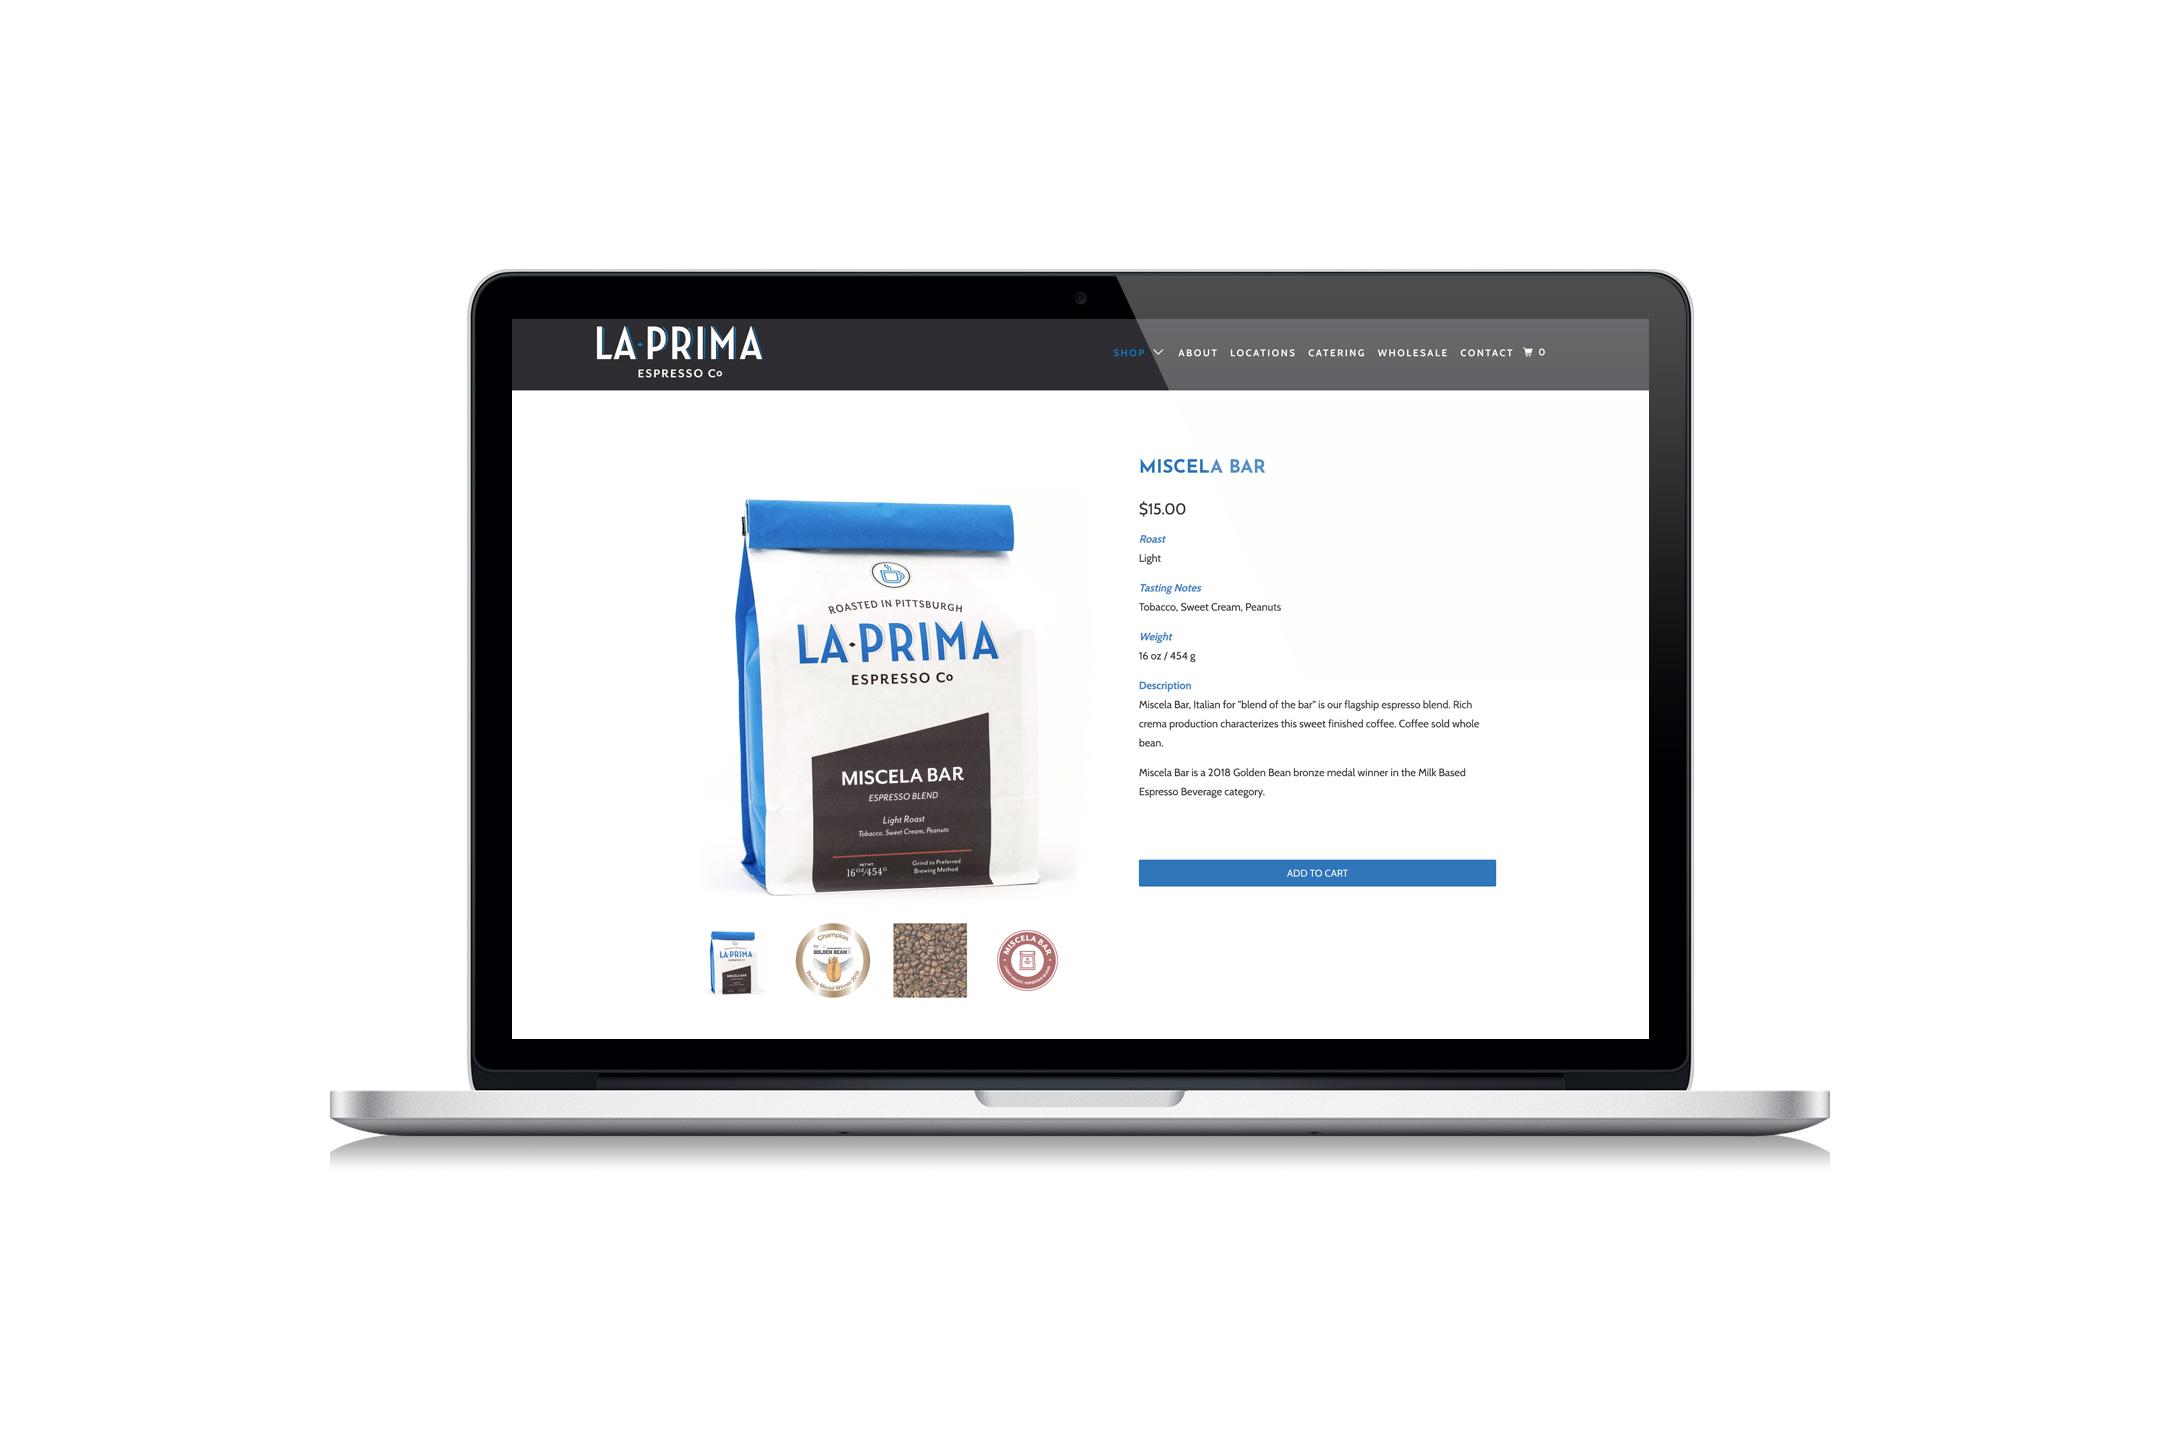 laprima_website_bootstrap_design_co1.jpg